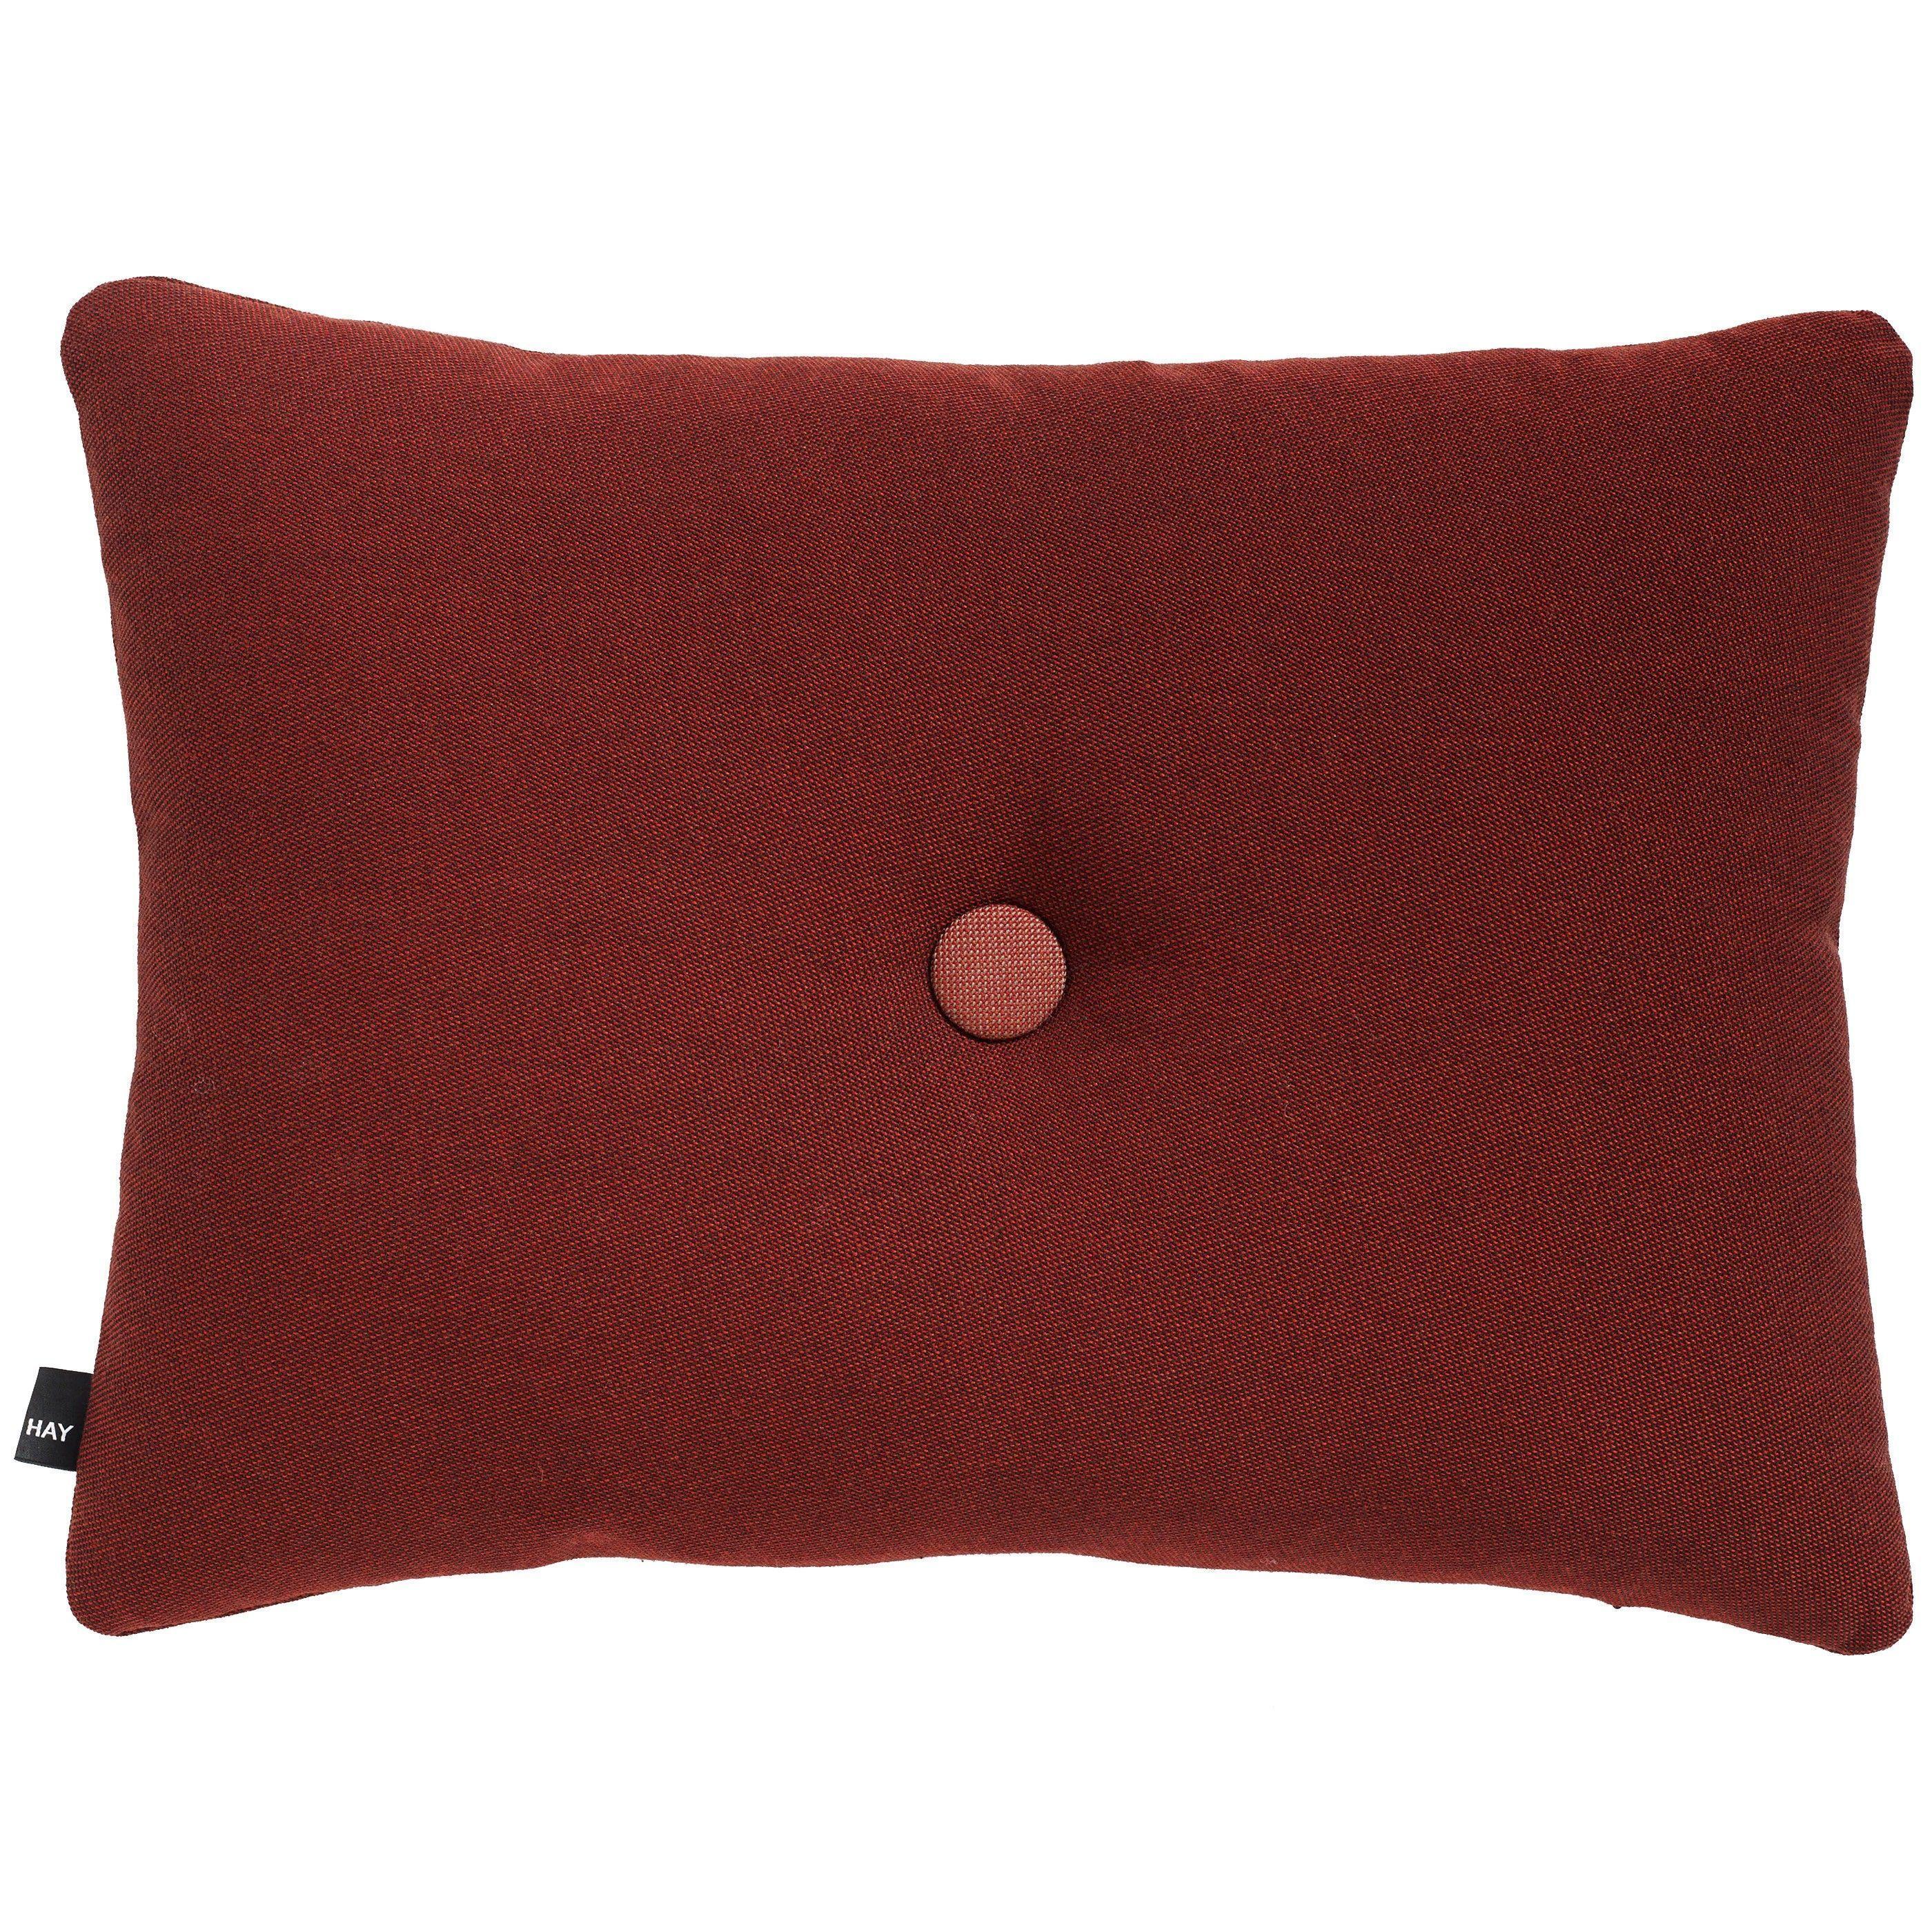 hay-dot-cushion-rime-kussen-rust